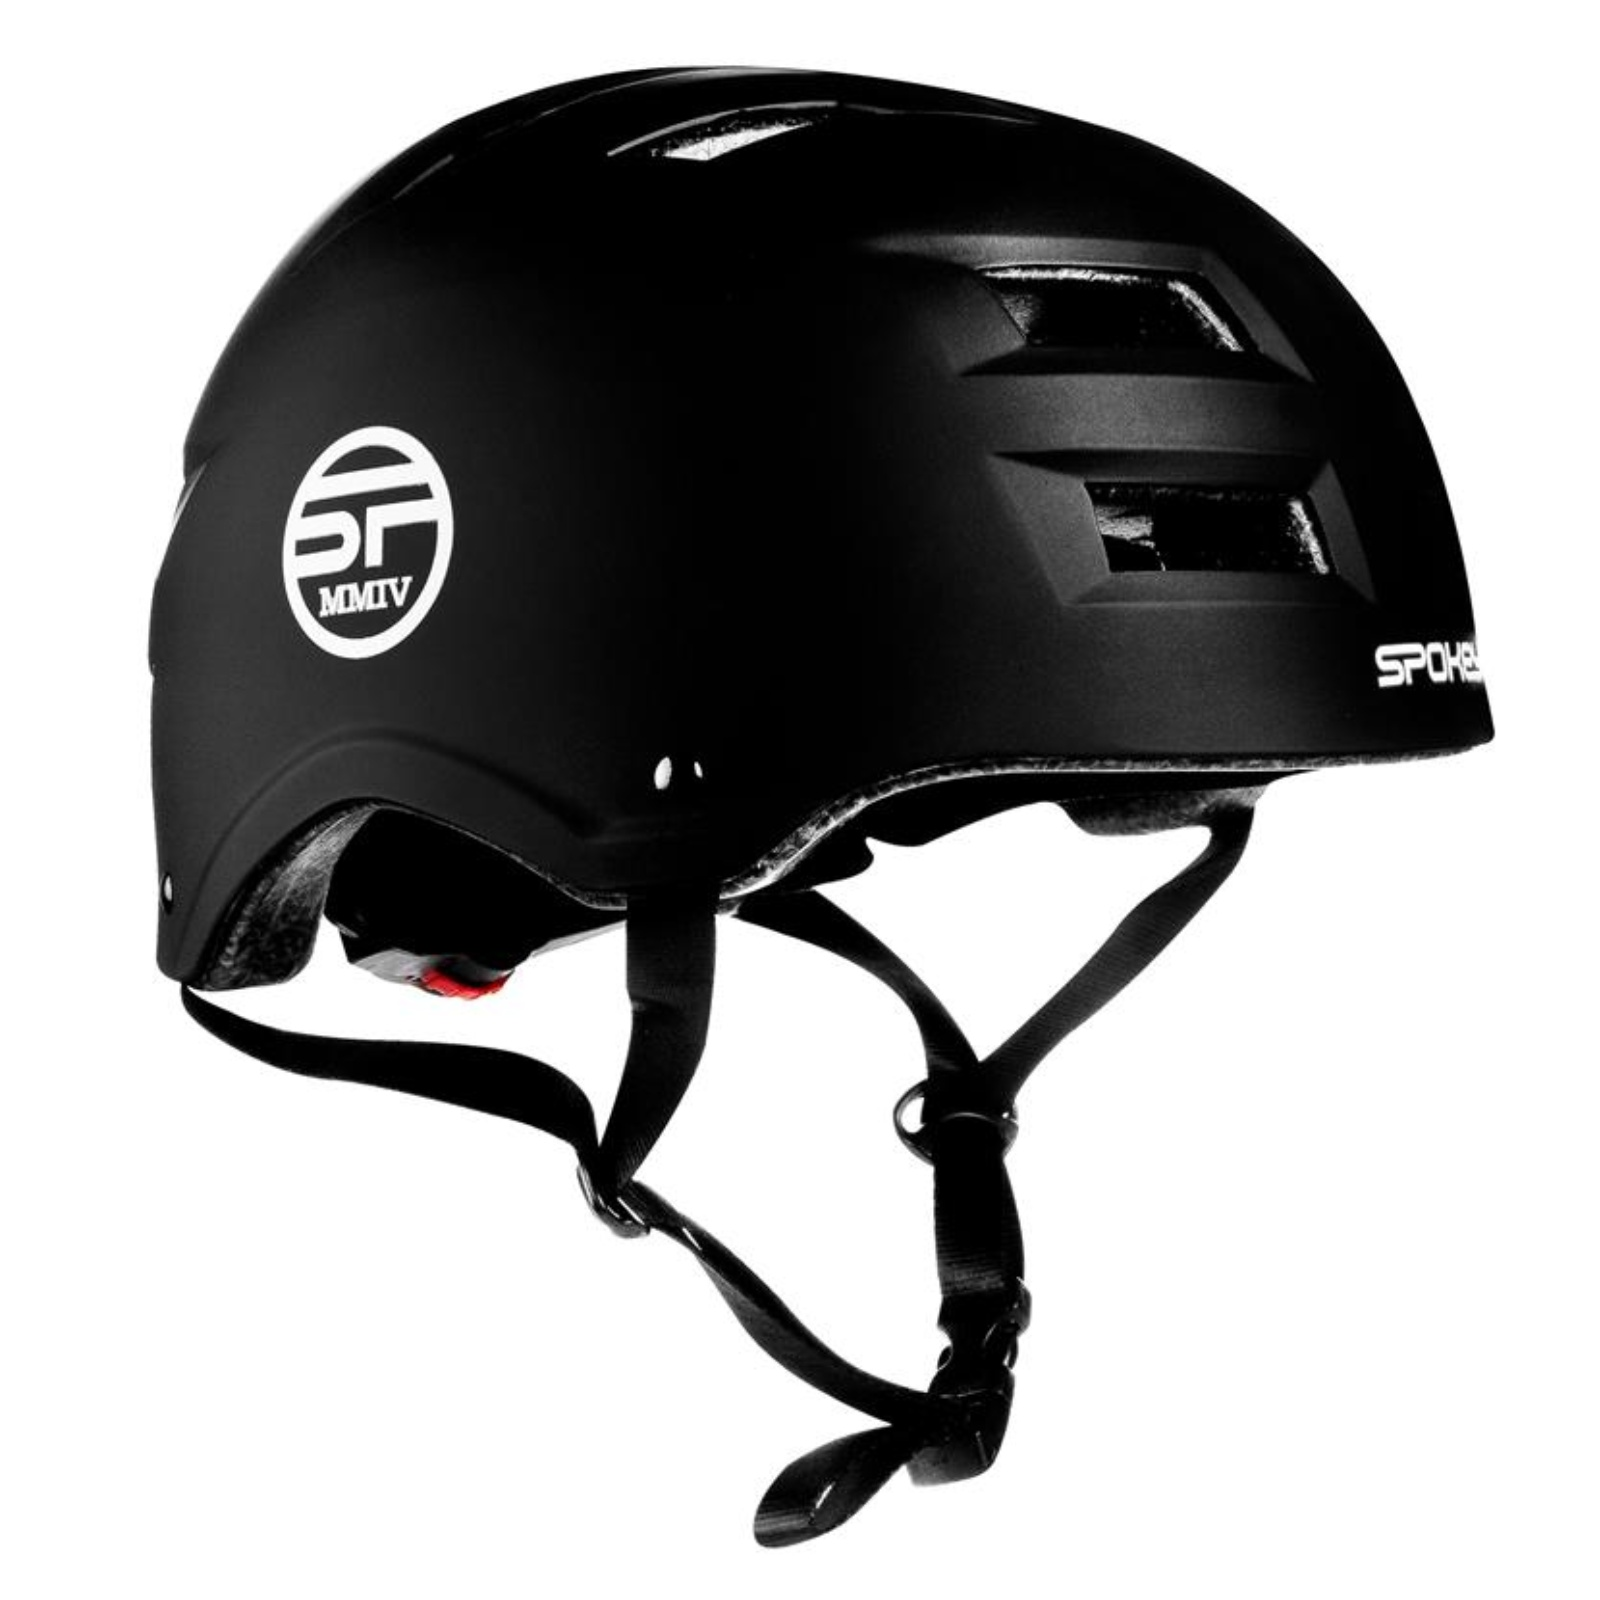 Cyklo přilba SPOKEY Ninja 58-61 cm